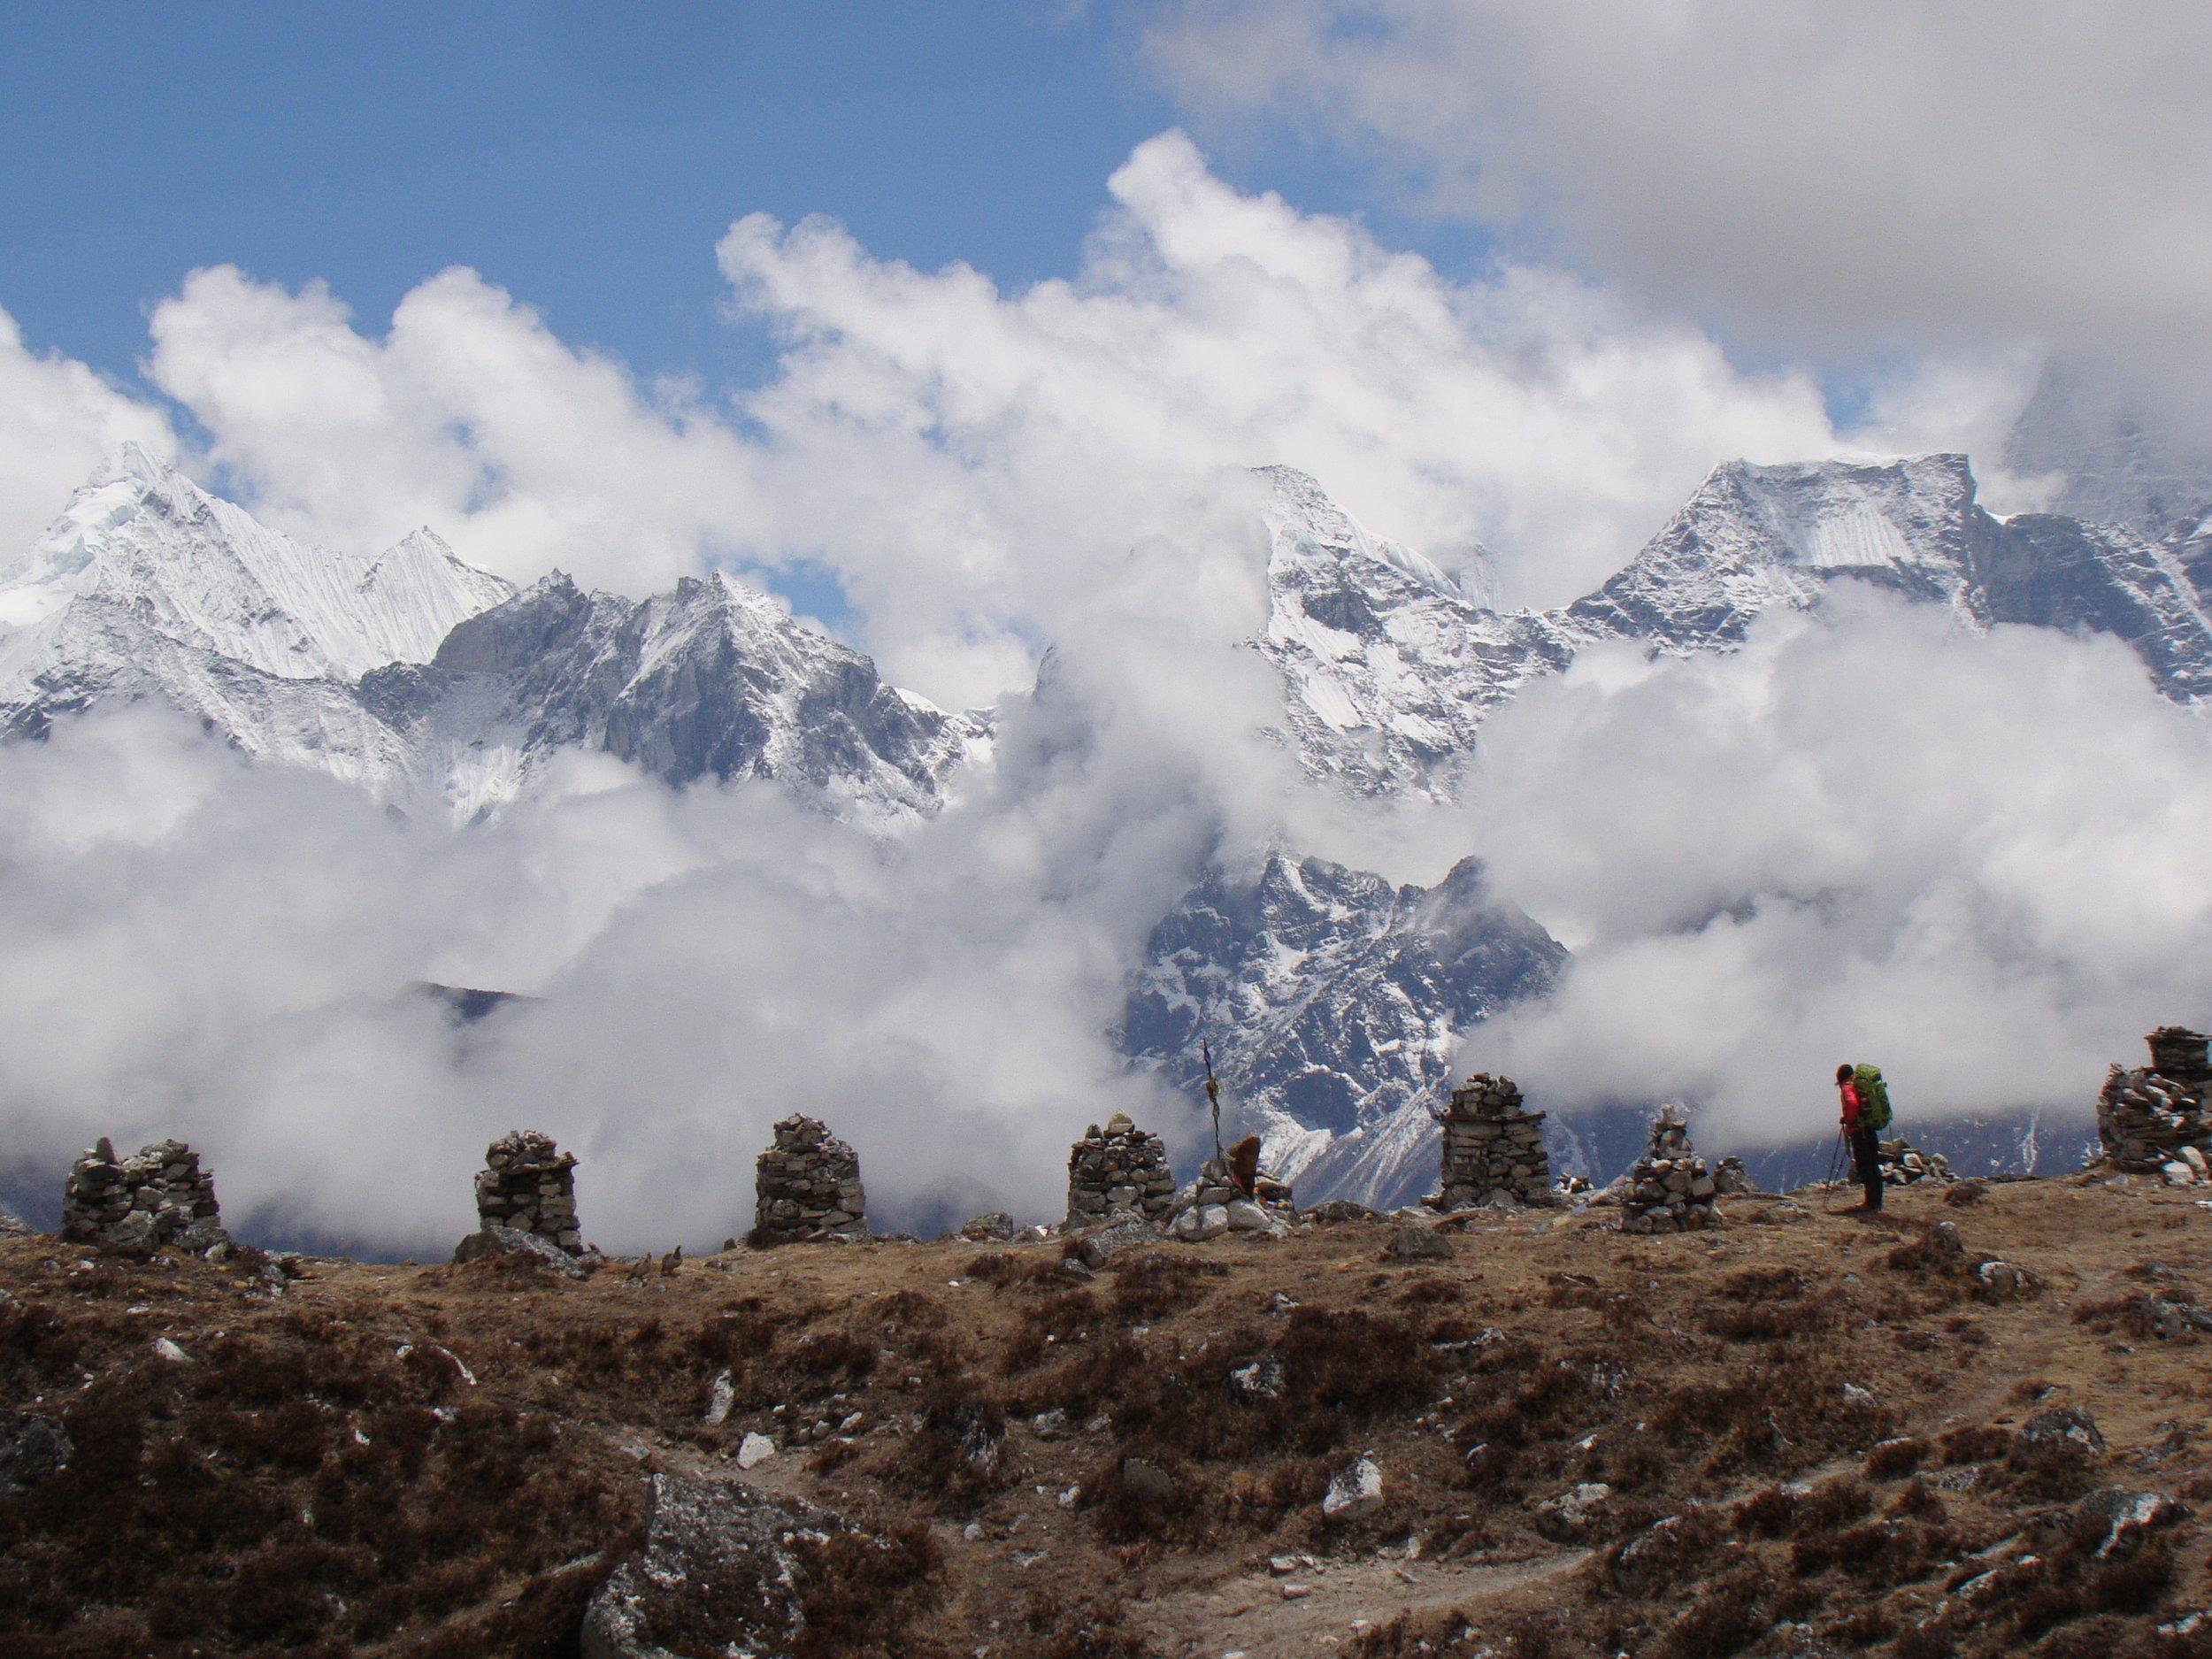 A silent moment beside memorial stupas - Photo by Filip Lhota